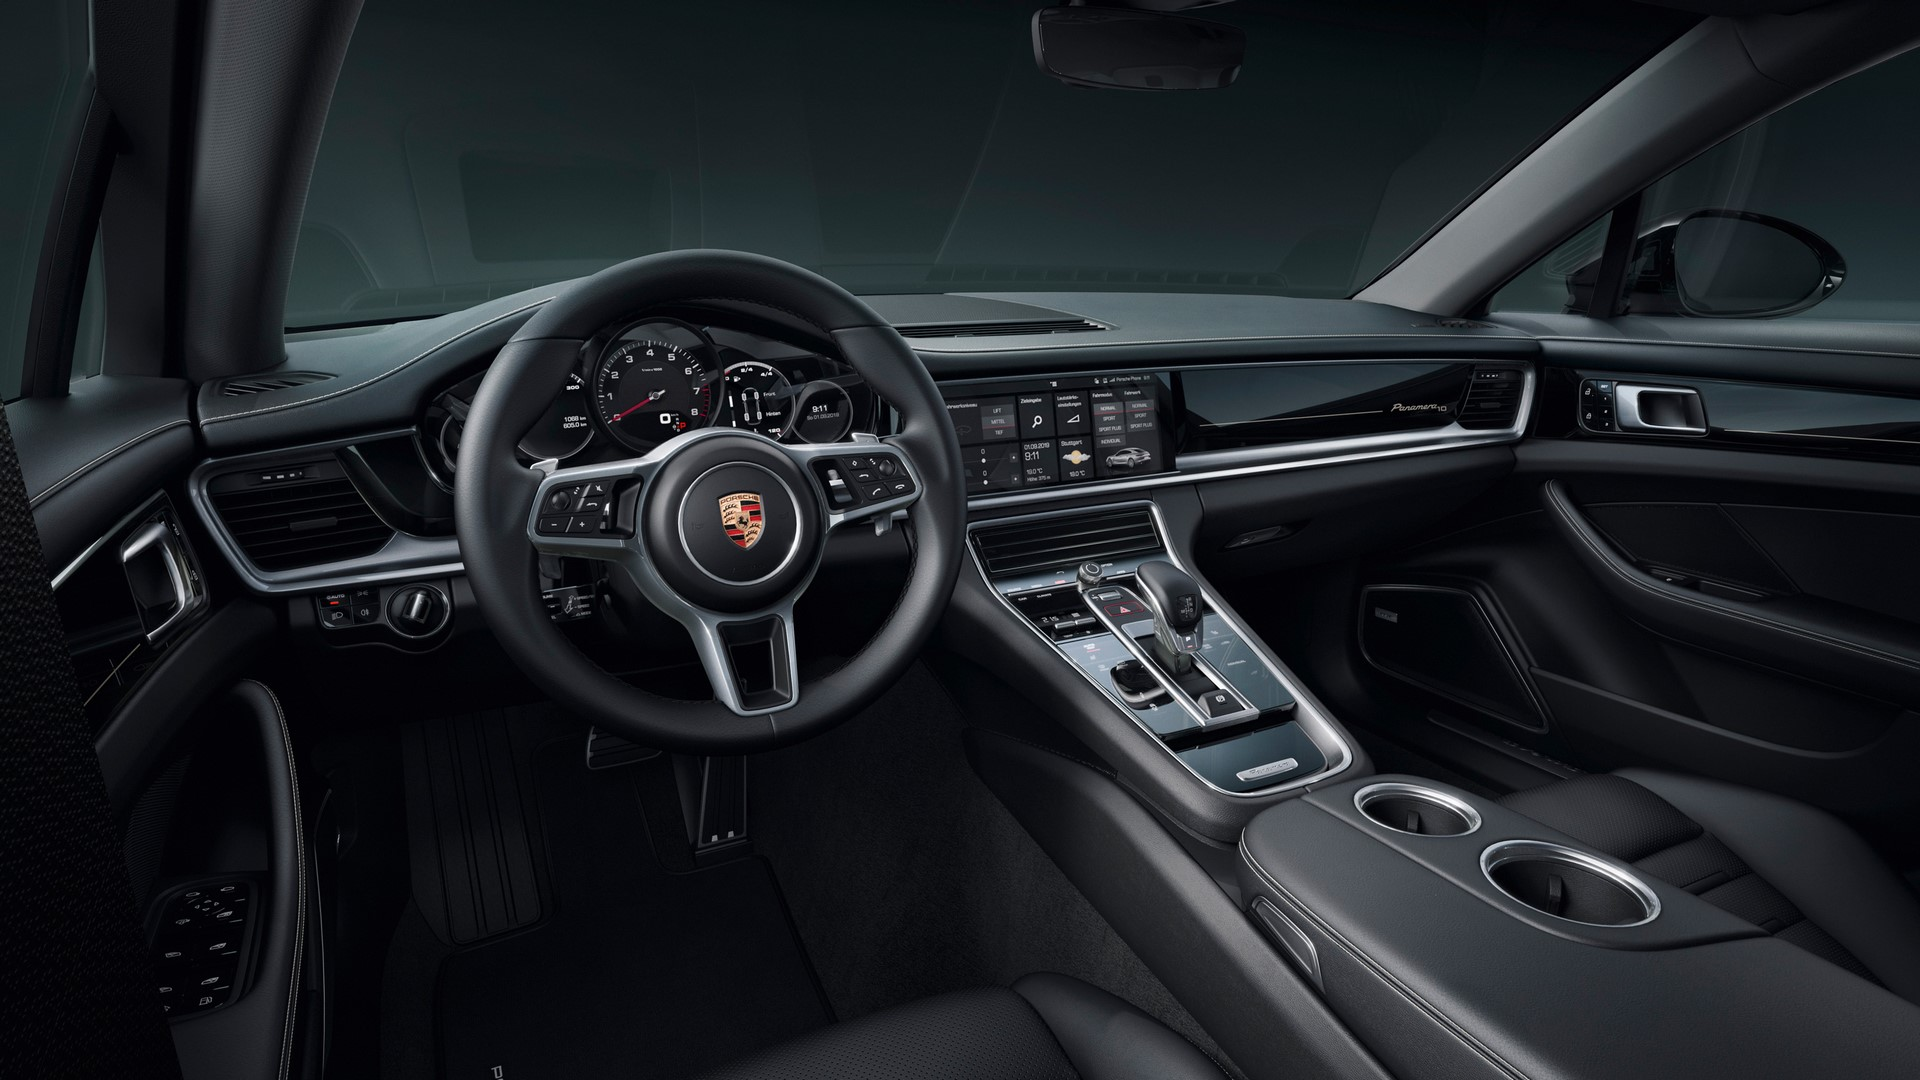 Porsche-Panamera-10-Years-Edition-8